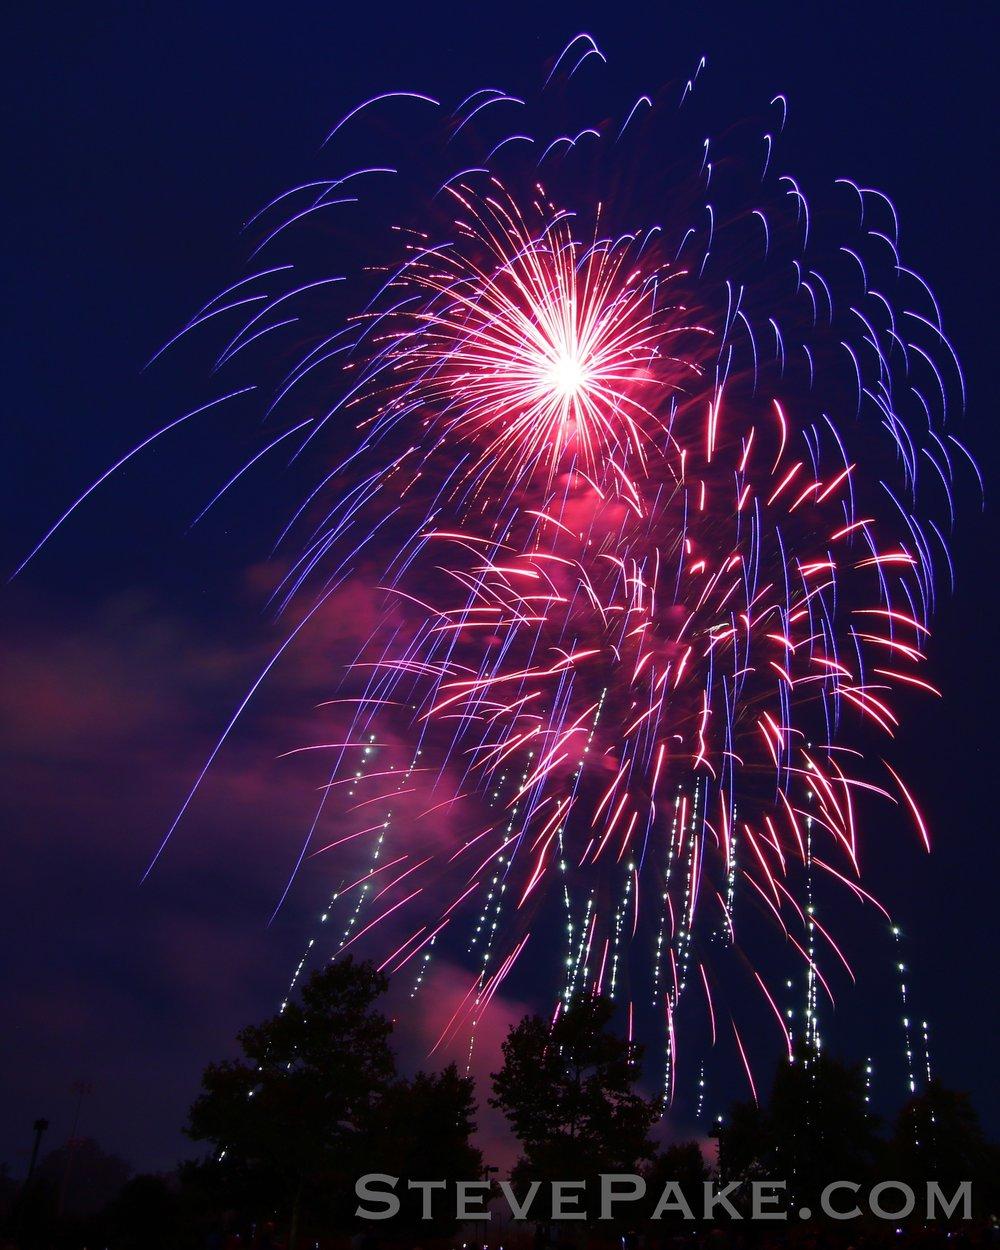 Fireworks2018_27_GE3A8541ap-HD-WM.jpg